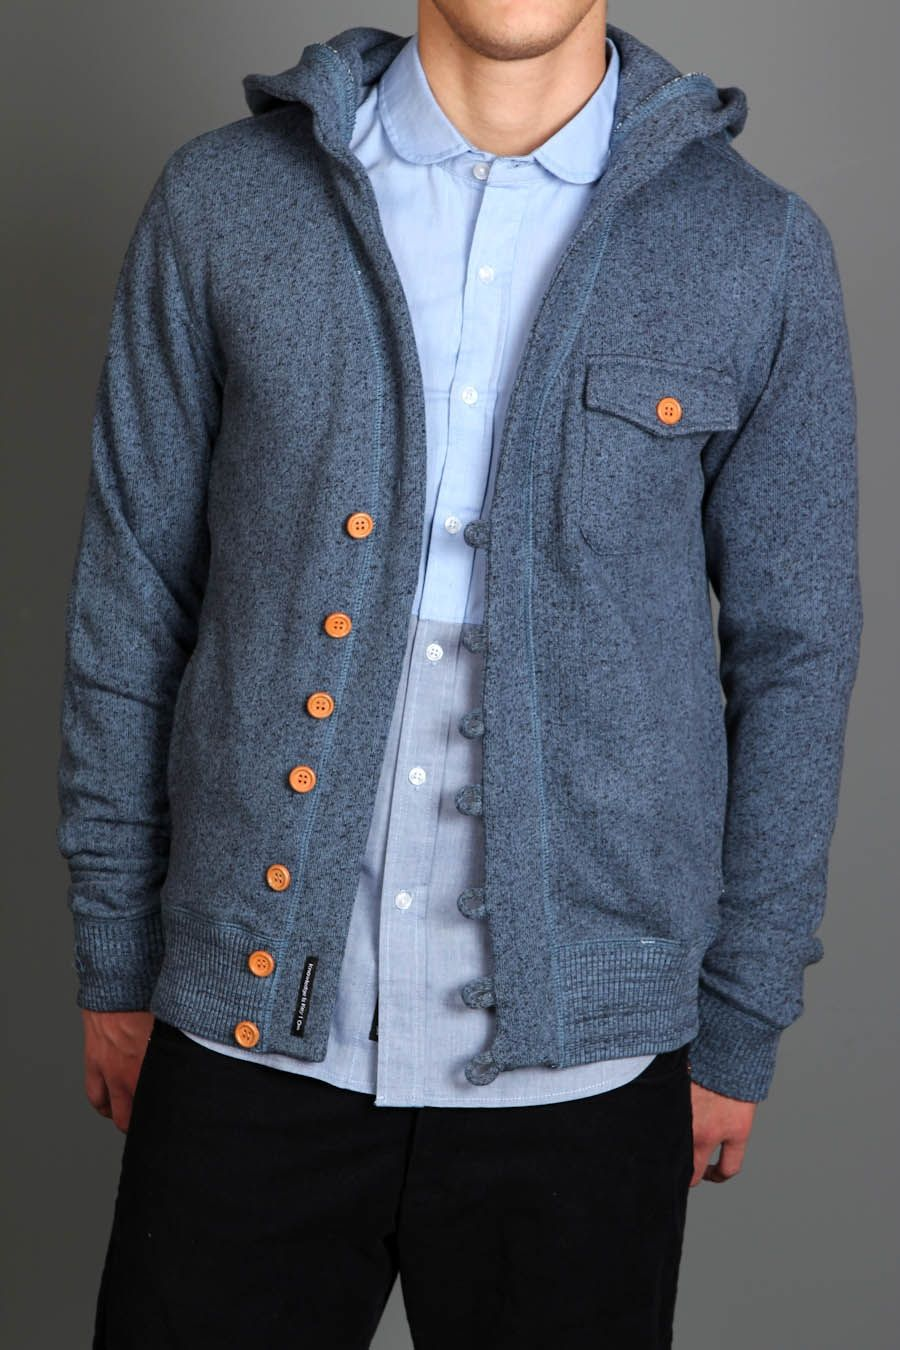 ooo I like this. hooded cardigan